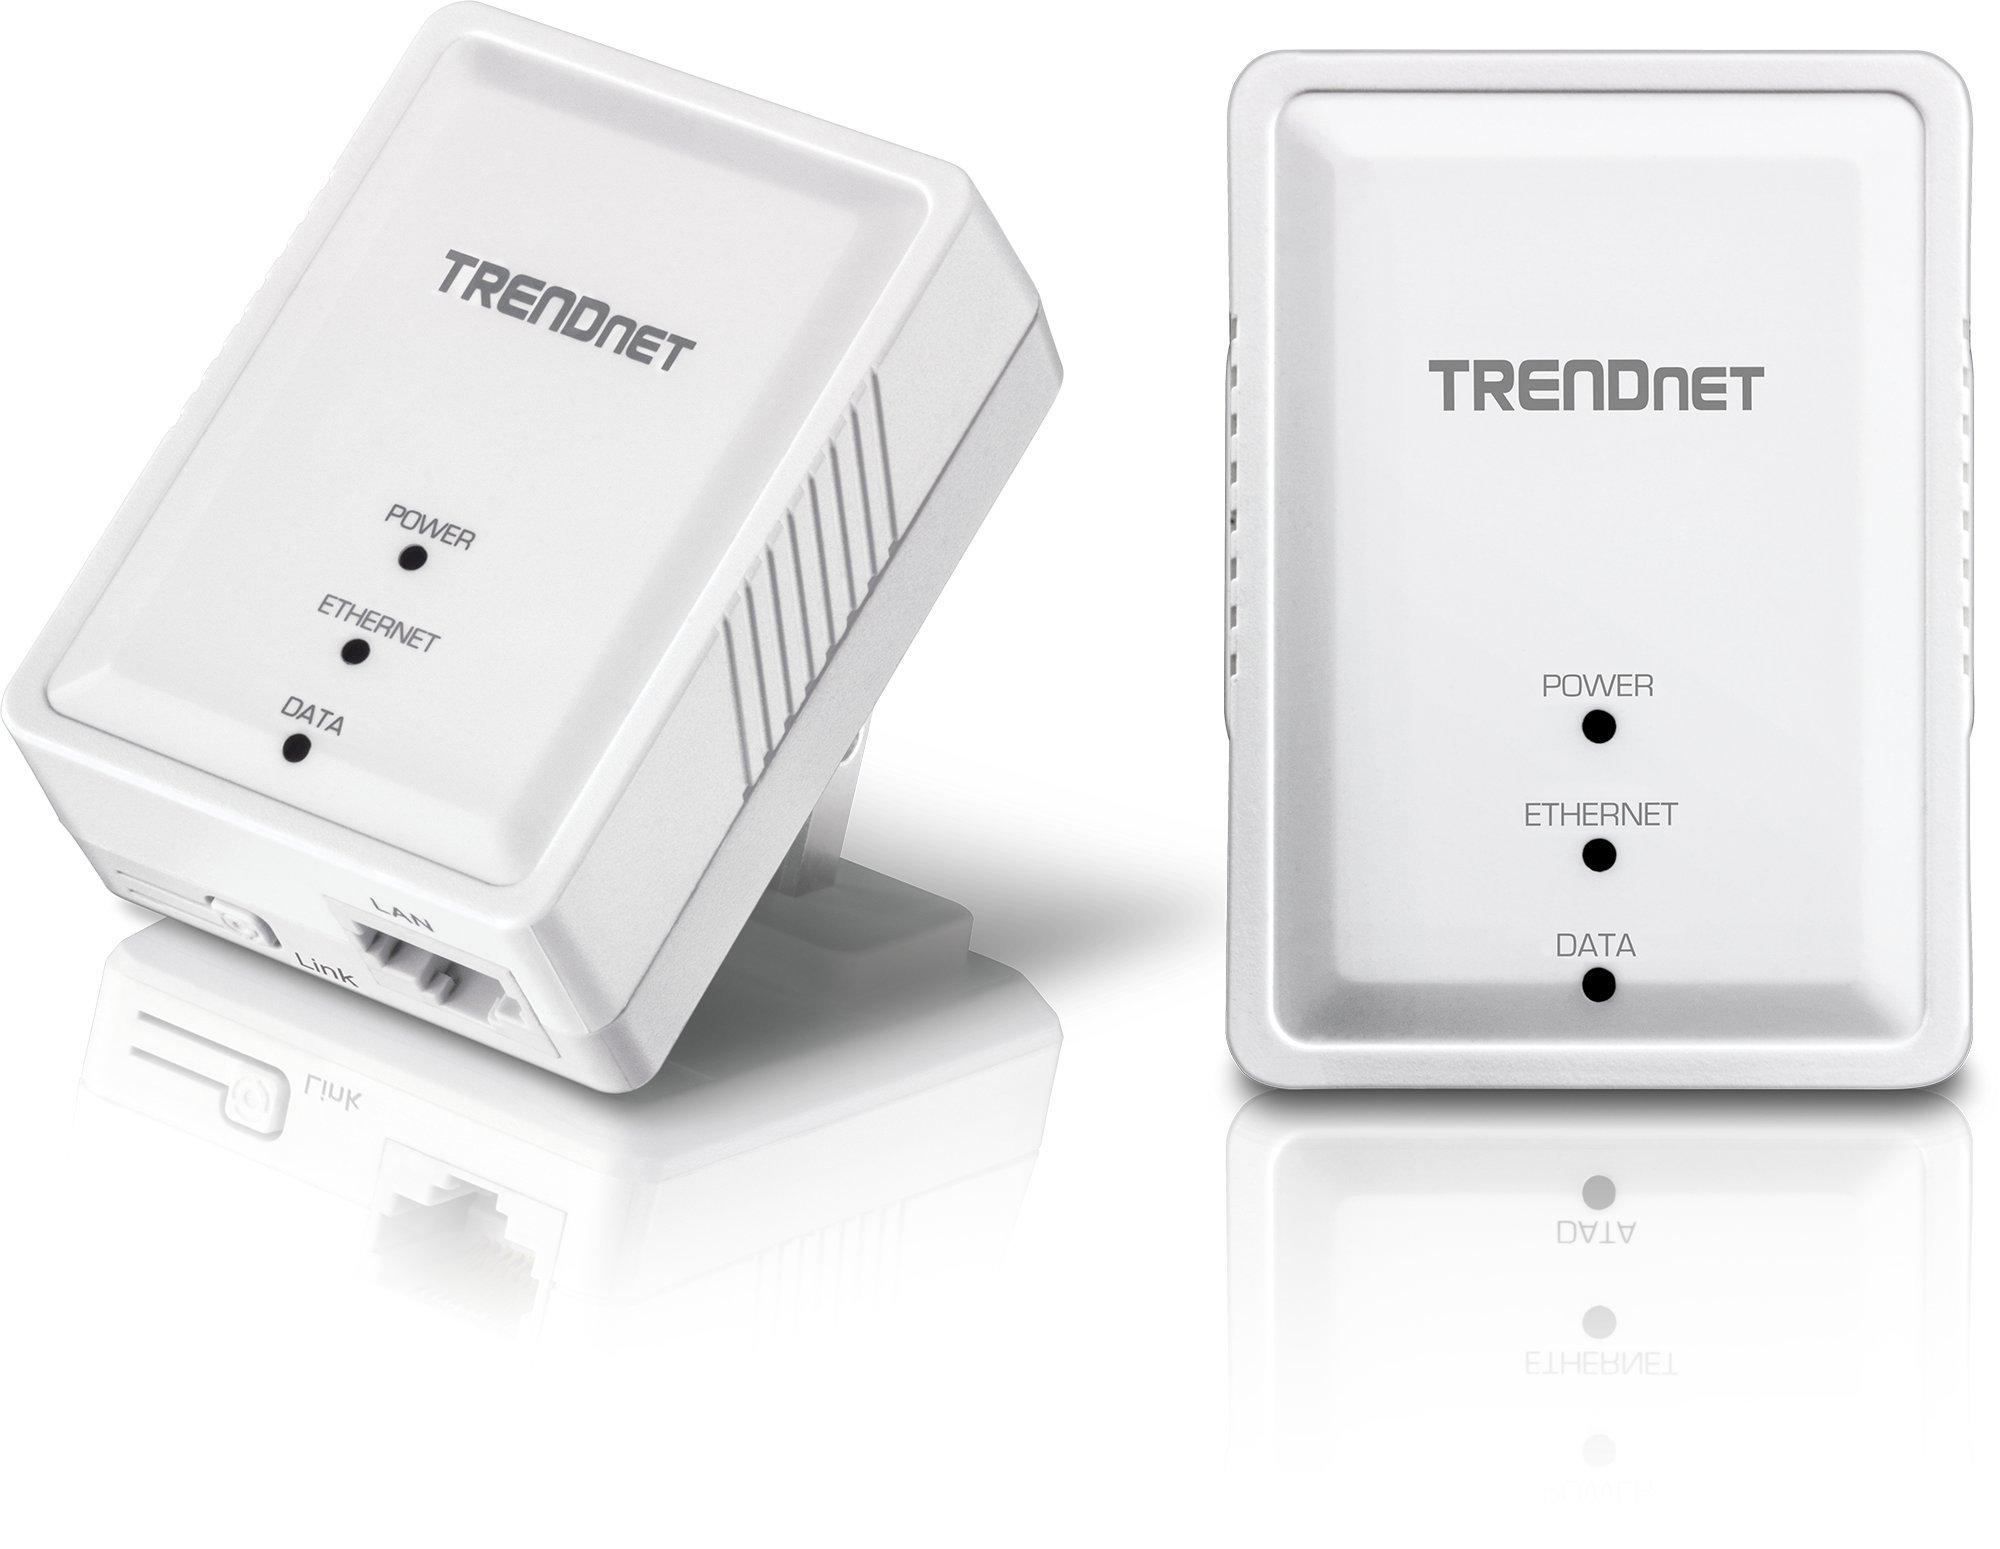 TRENDnet Powerline 500 AV Nano Adapter Kit, Includes 2 x TPL-406E Adapters, Cross Compatible with Powerline 600/500/200,Windows 10, 8.1, 8, 7, Vista, XP, TPL-406E2K by TRENDnet